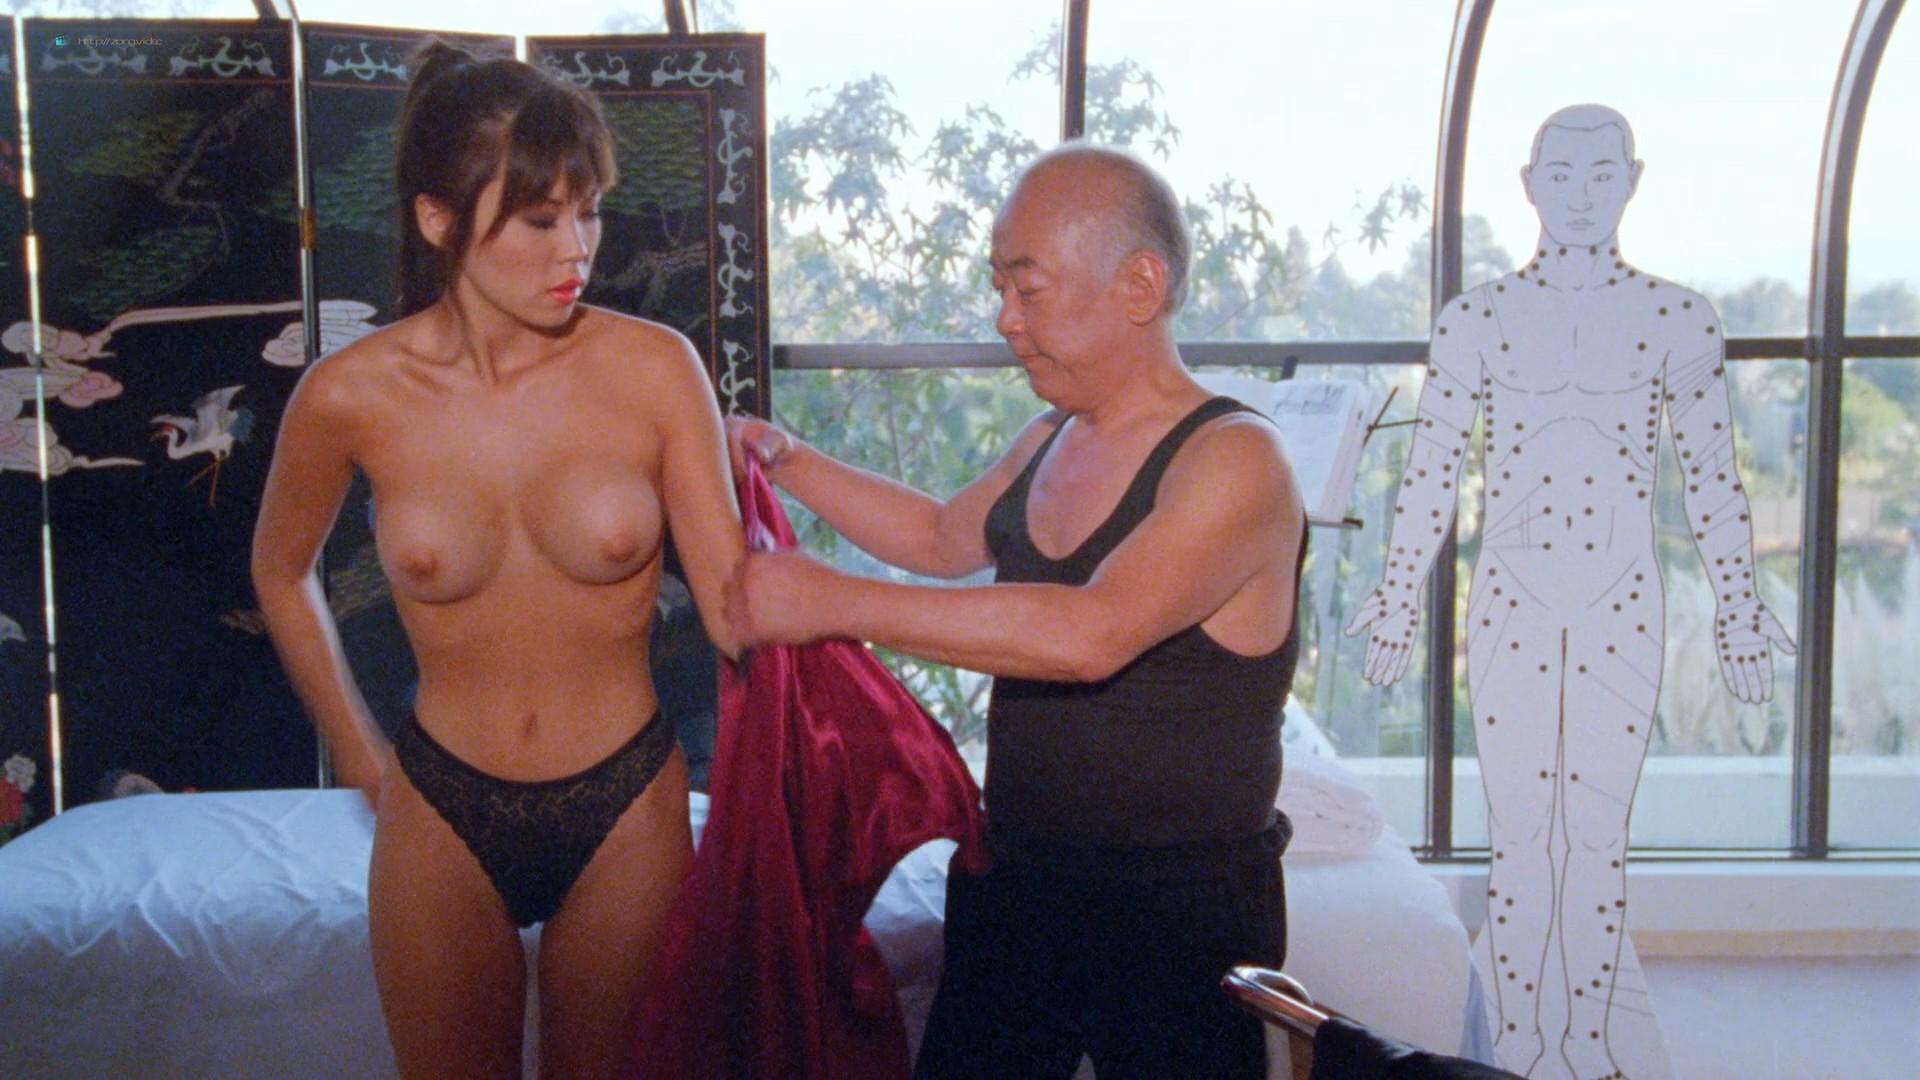 Dona Speir nude Pandora Peaks, Carolyn Liu and others nude too - Do or Die (1991) 1080p BluRay (18)